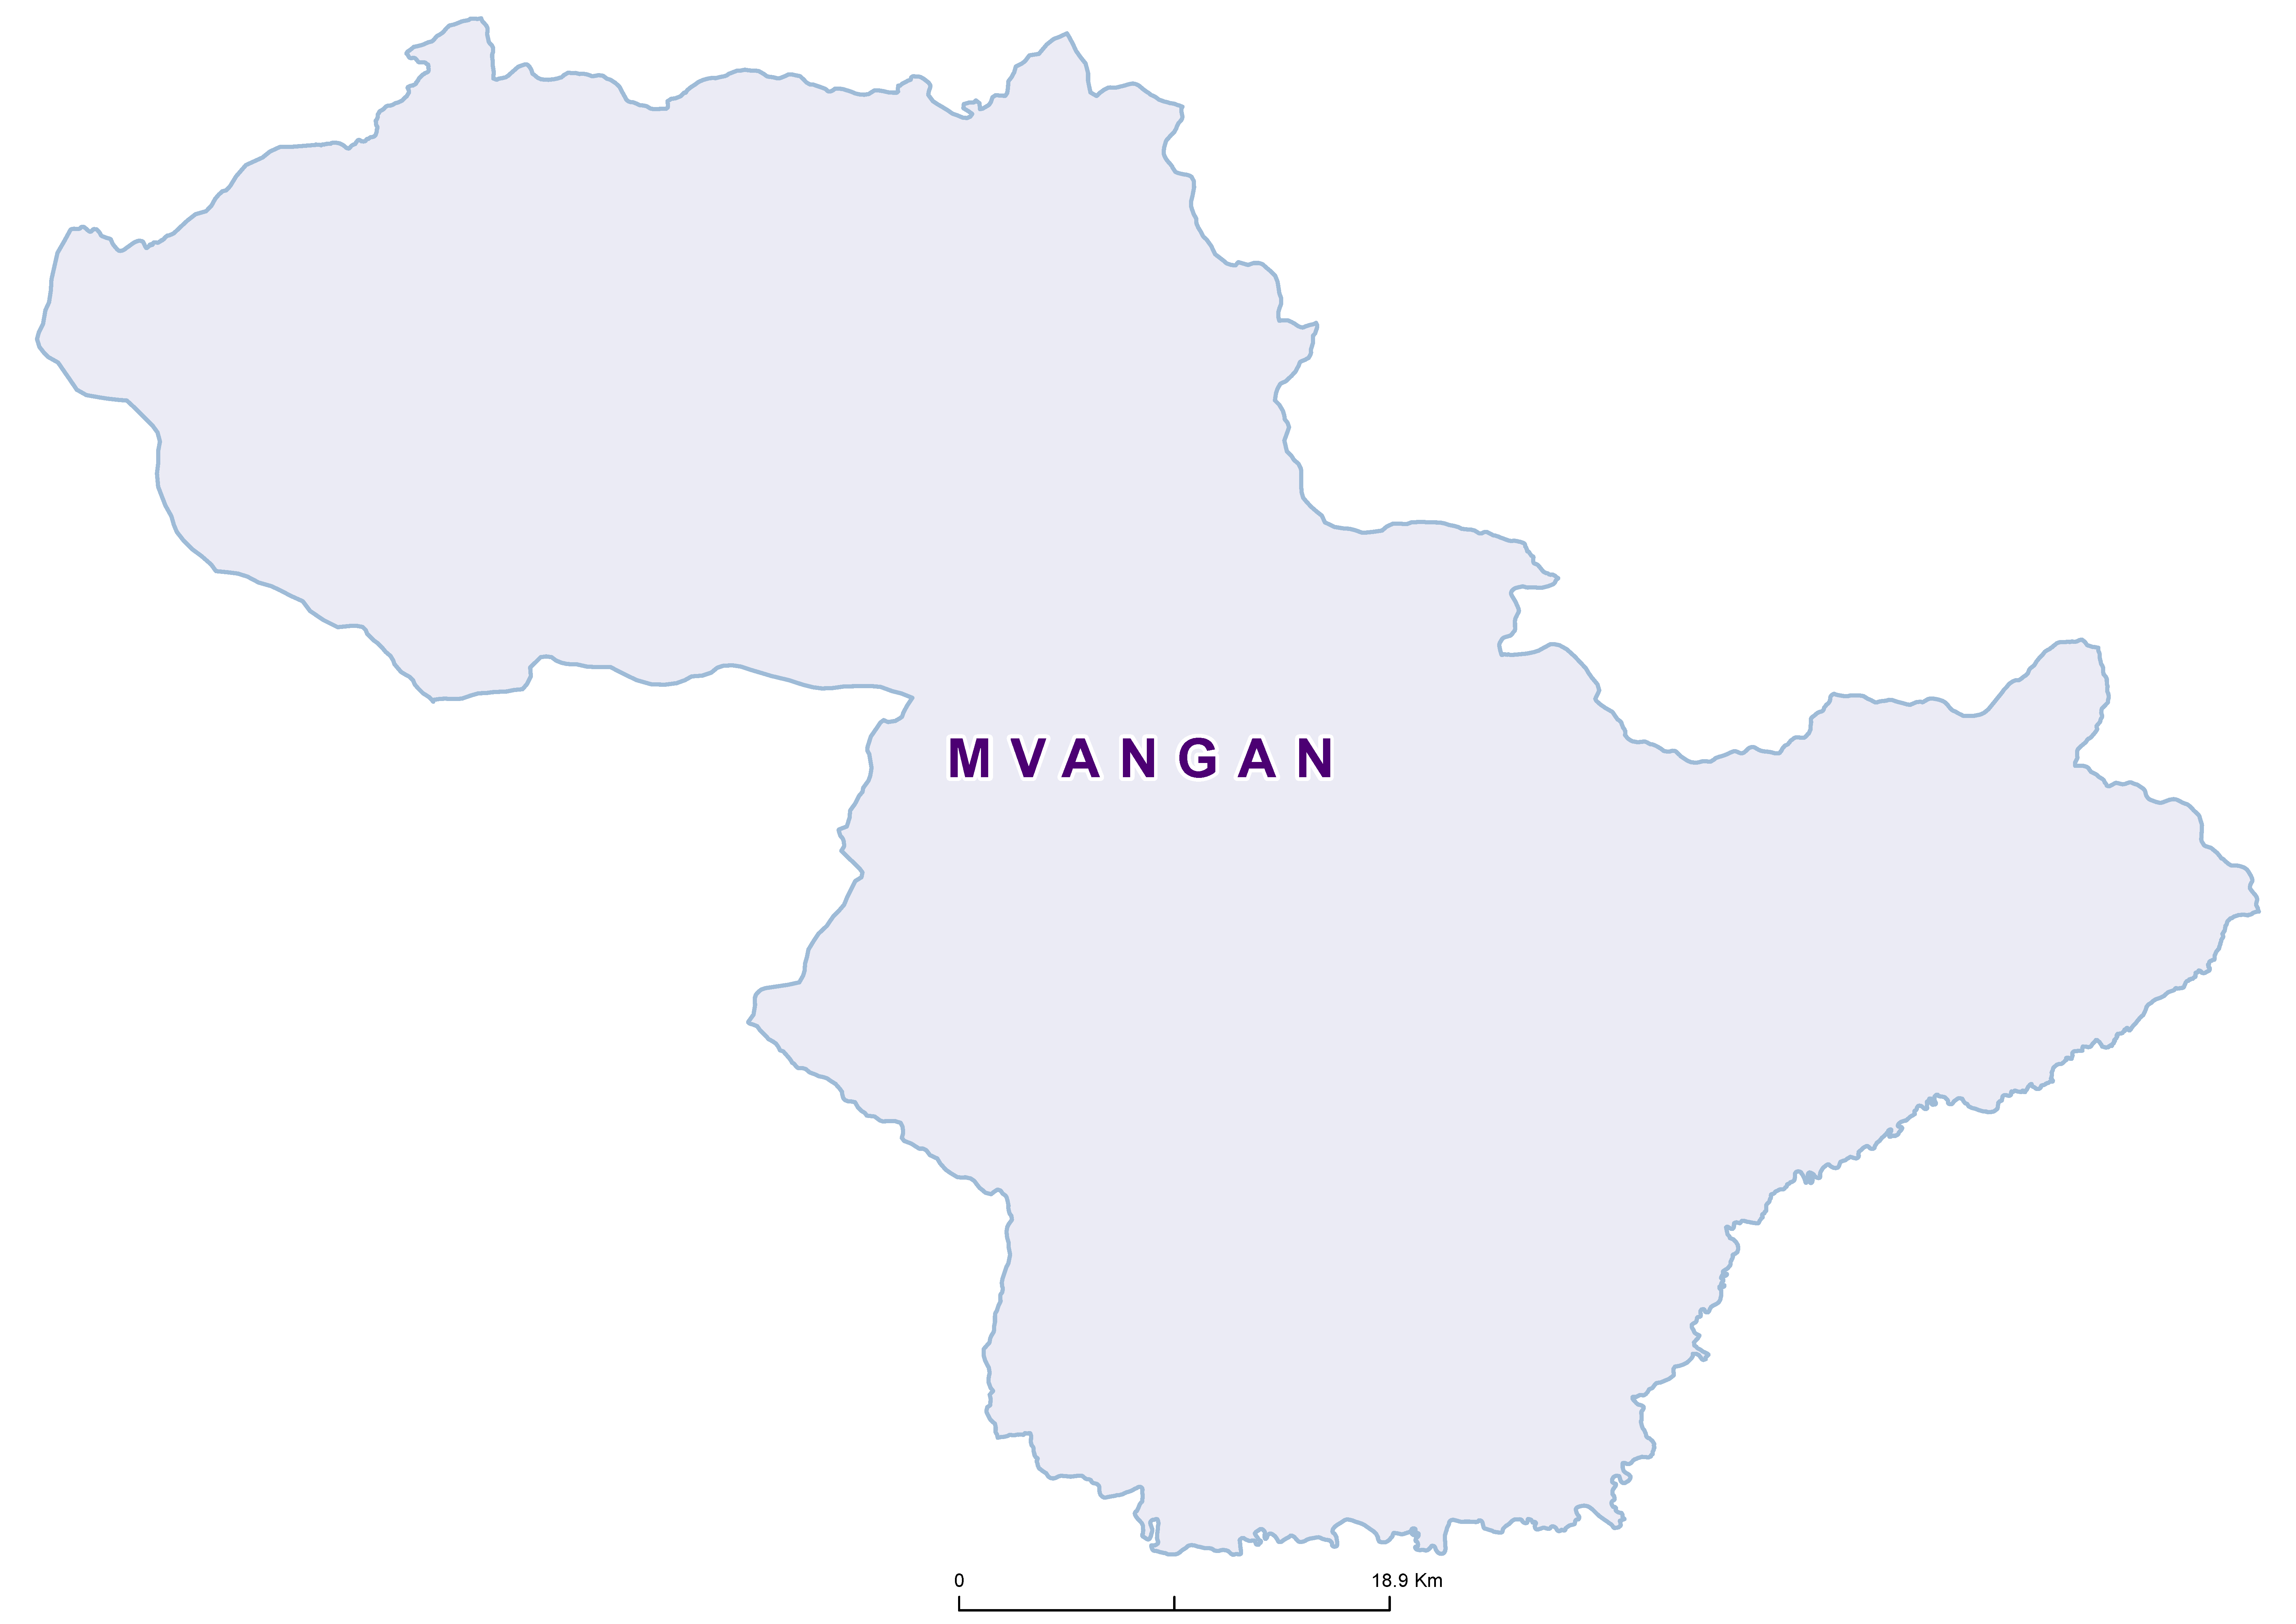 Mvangan Mean SCH 20180001